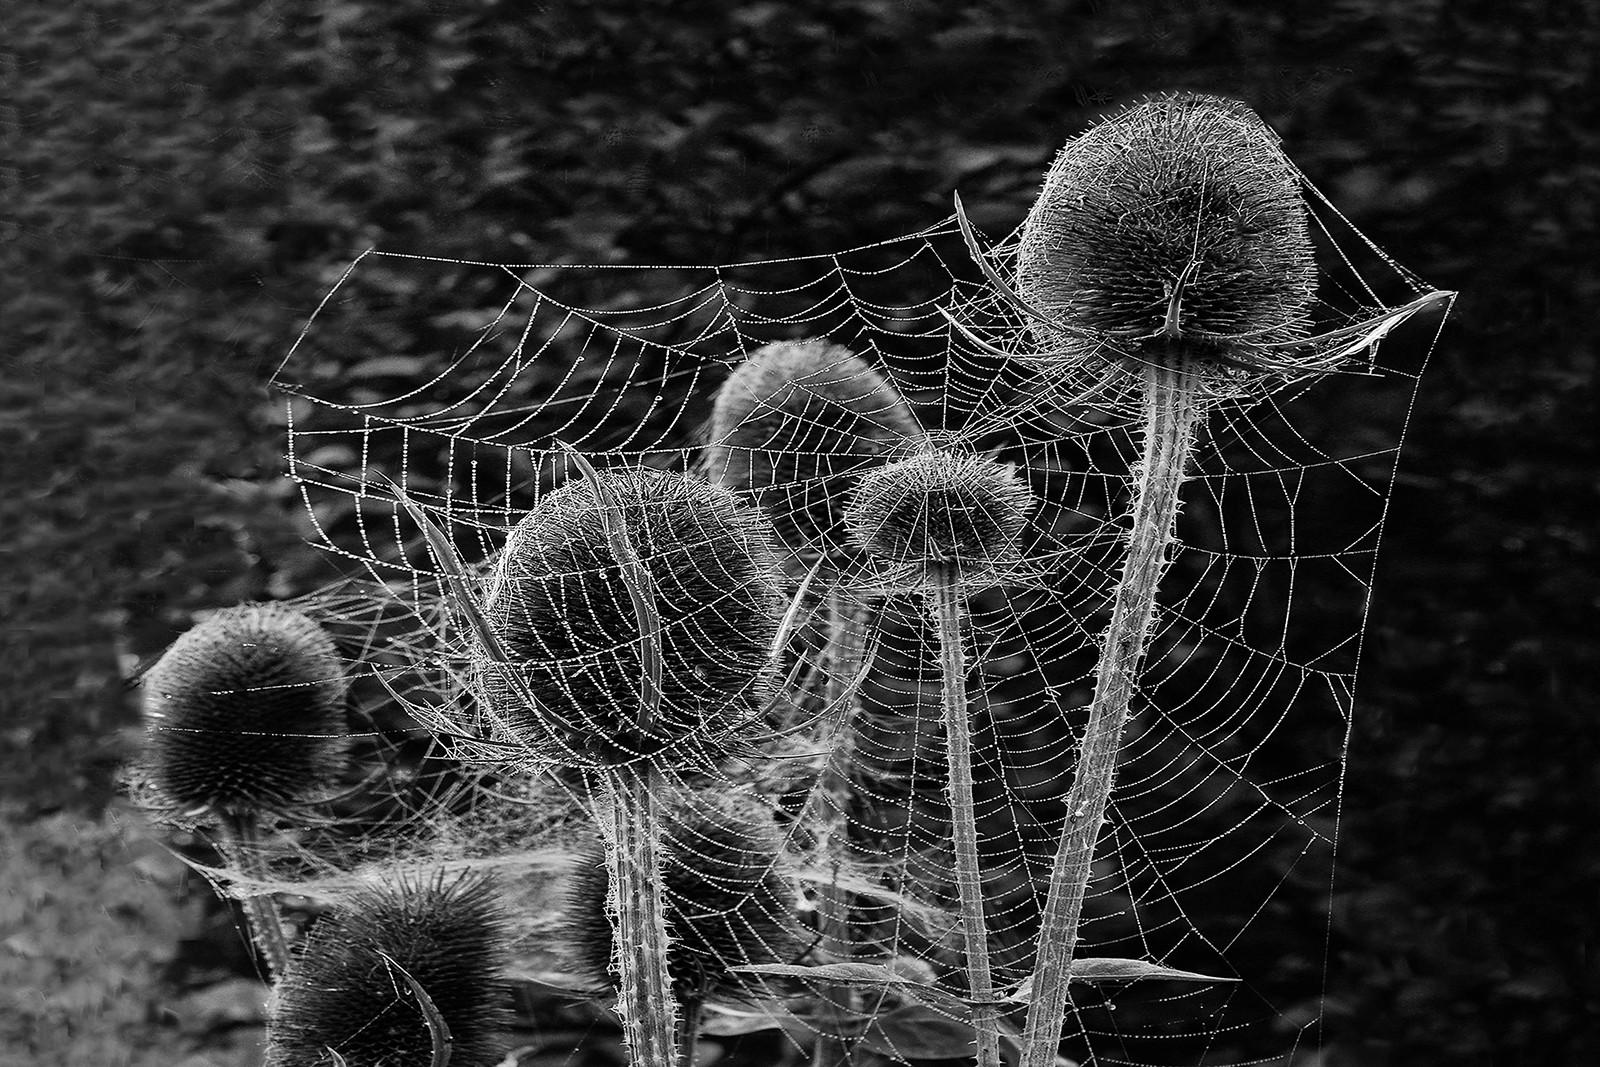 MONO - Tassel with Web  by Dympna Heagney  (8 marks)